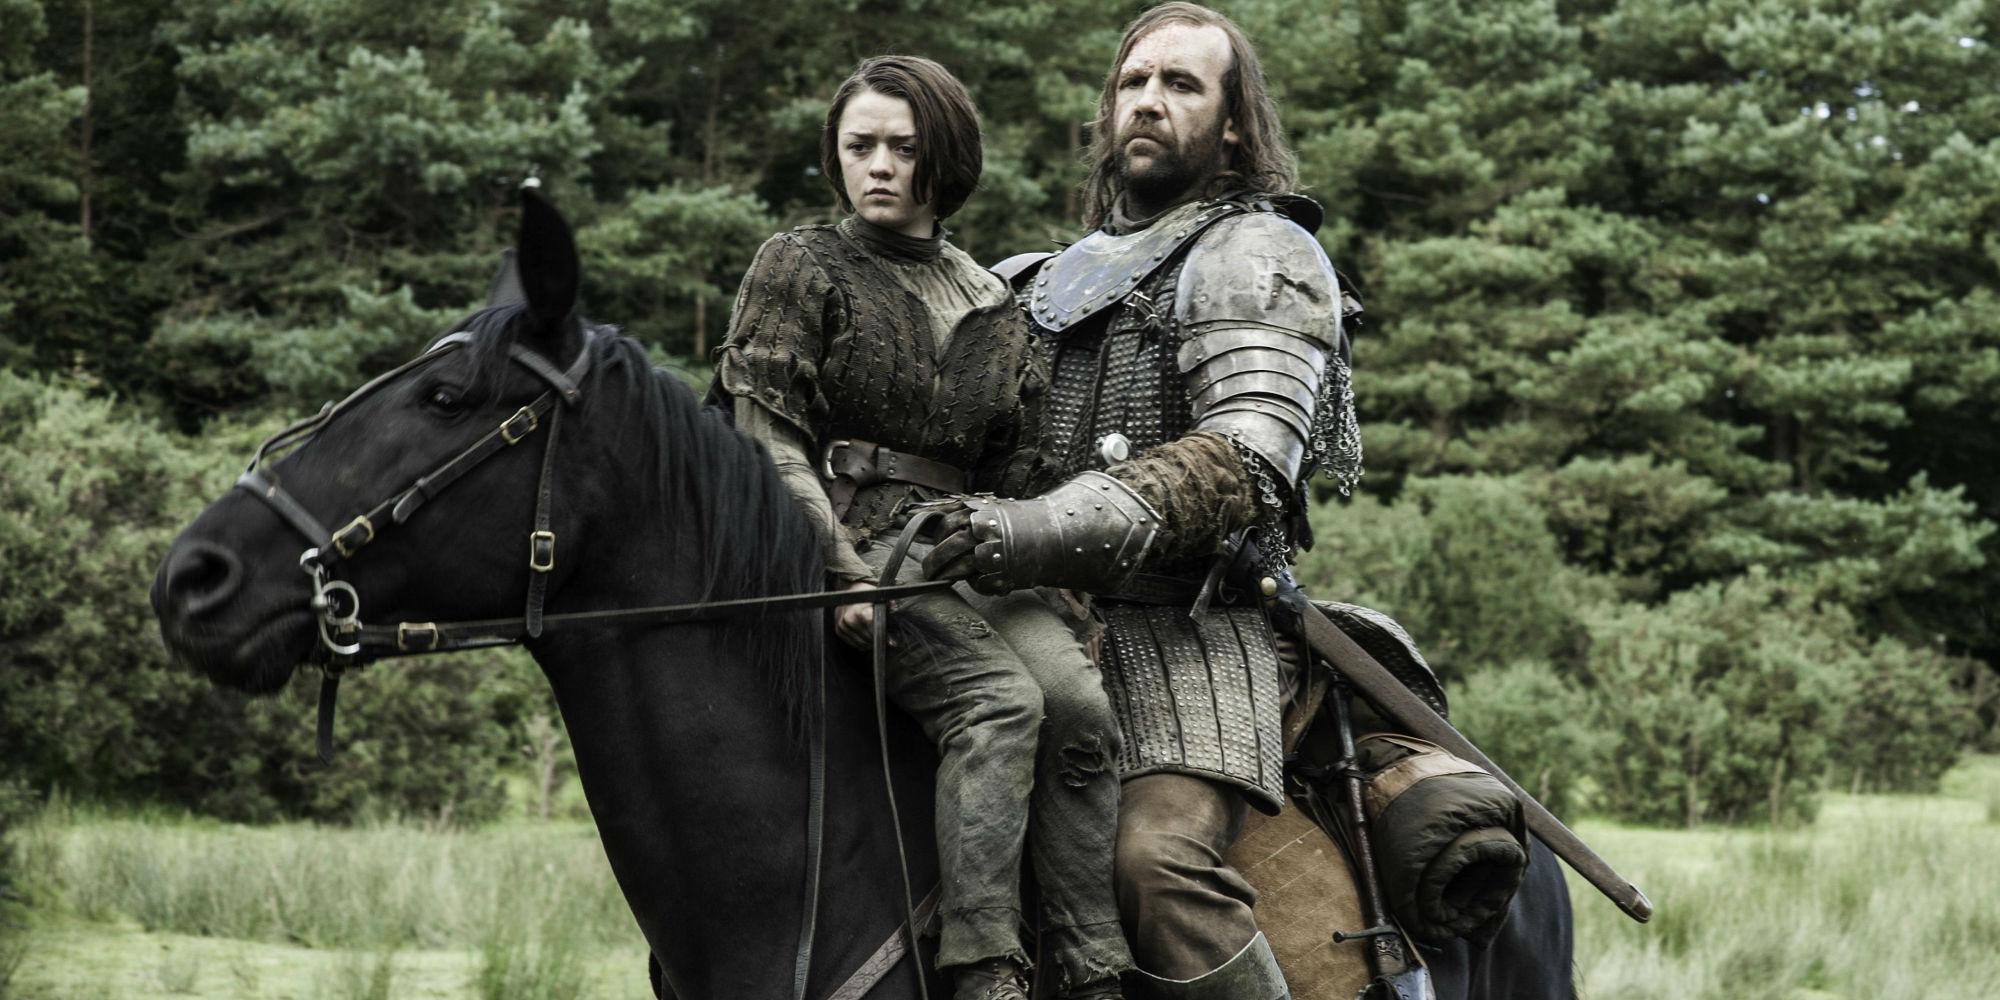 Game of Thrones - Hound and Arya